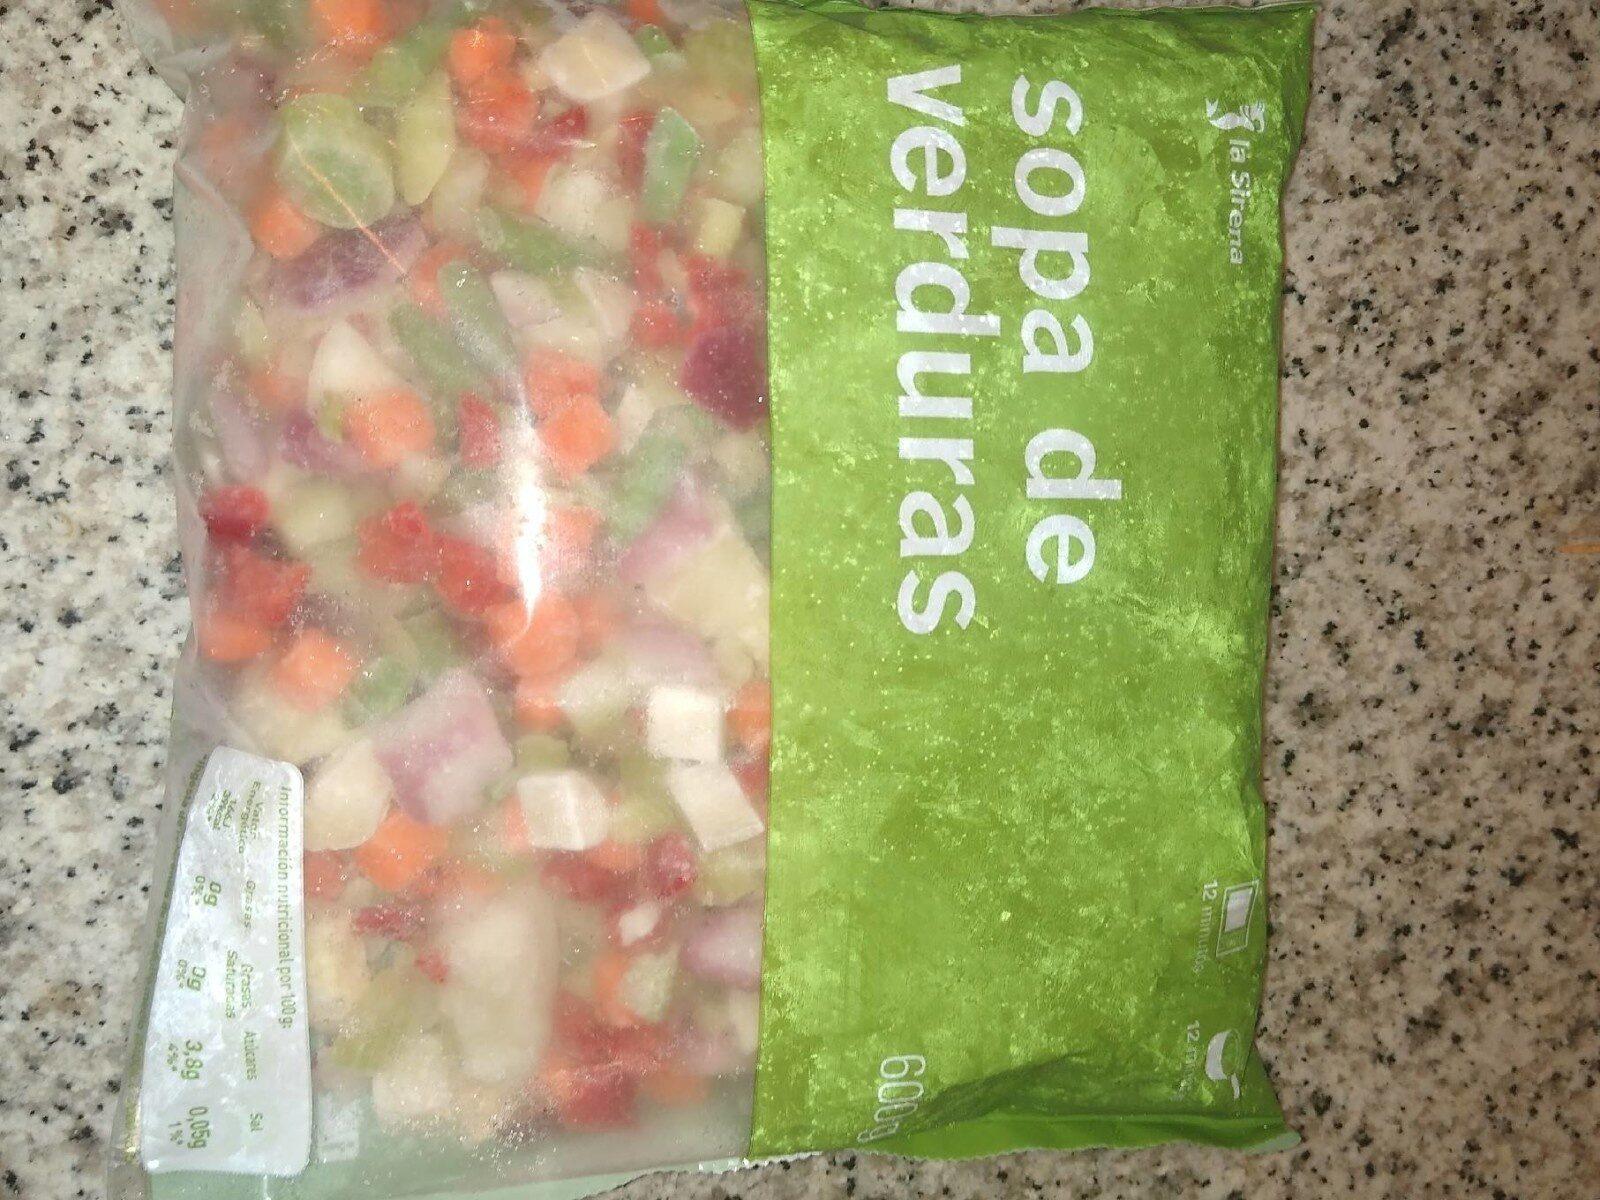 Sopa de verduras - Produit - es